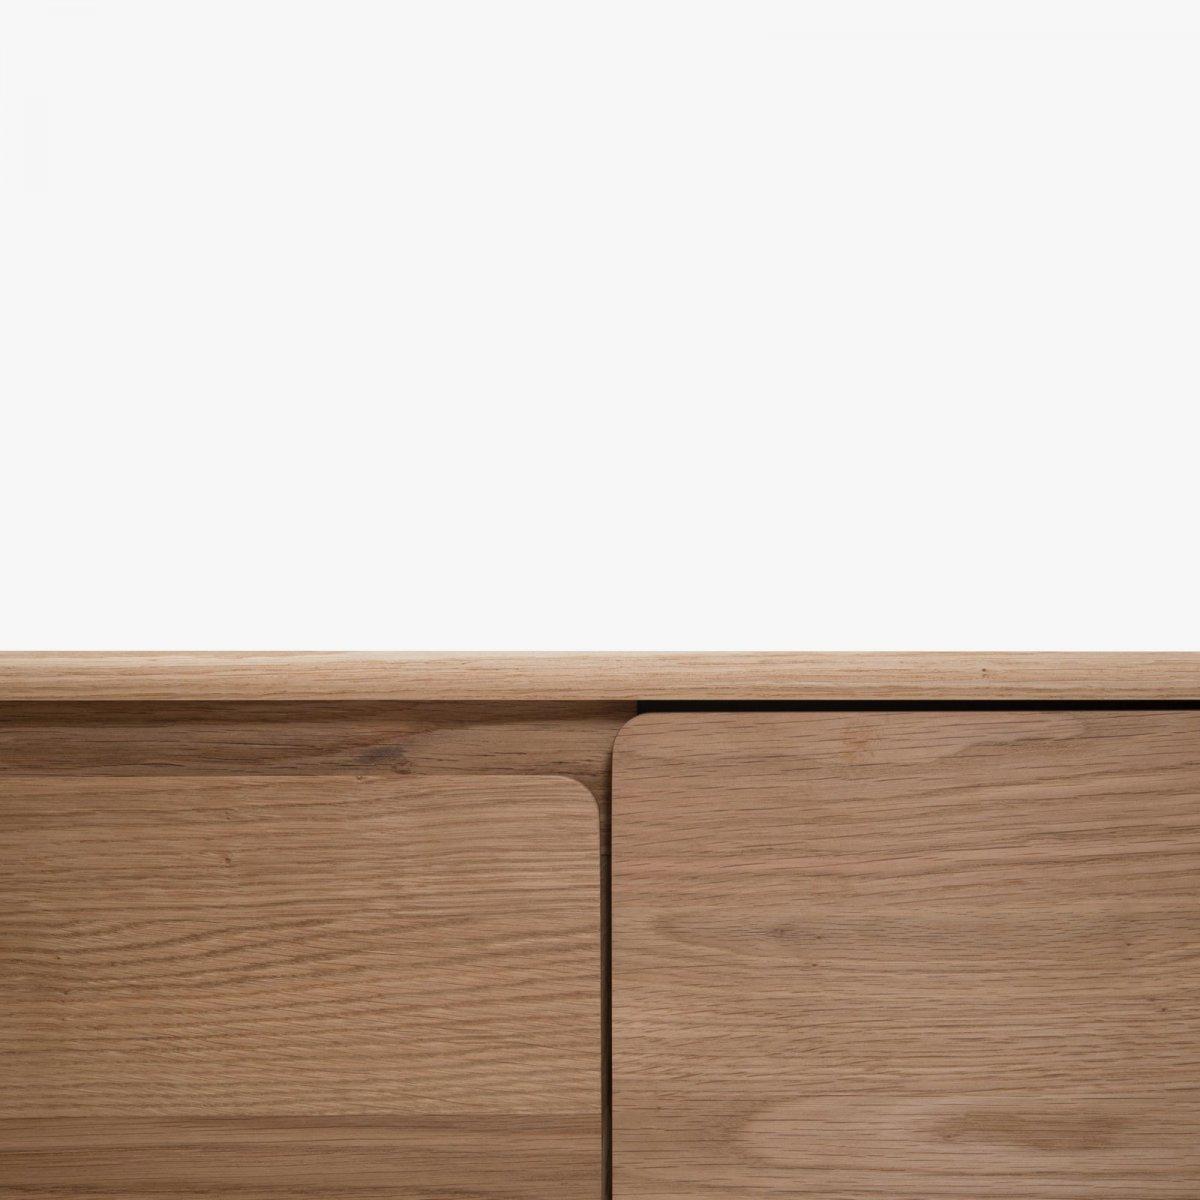 Fawn Lowboard, detail.